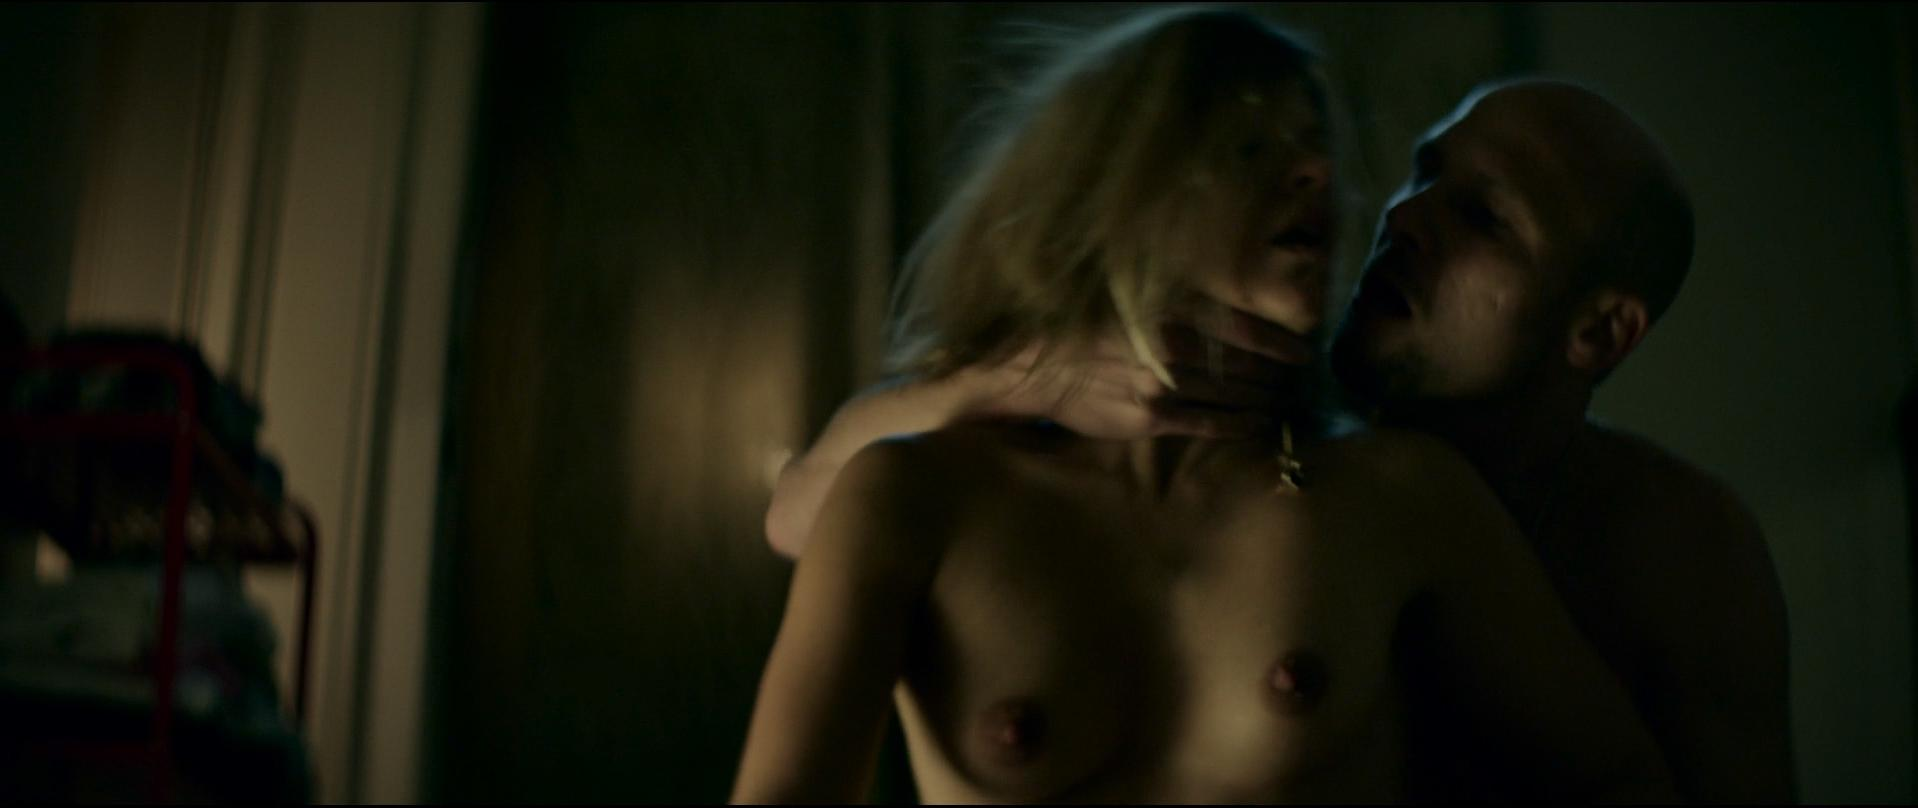 Veerle Baetens nude - D'Ardennen (2015)